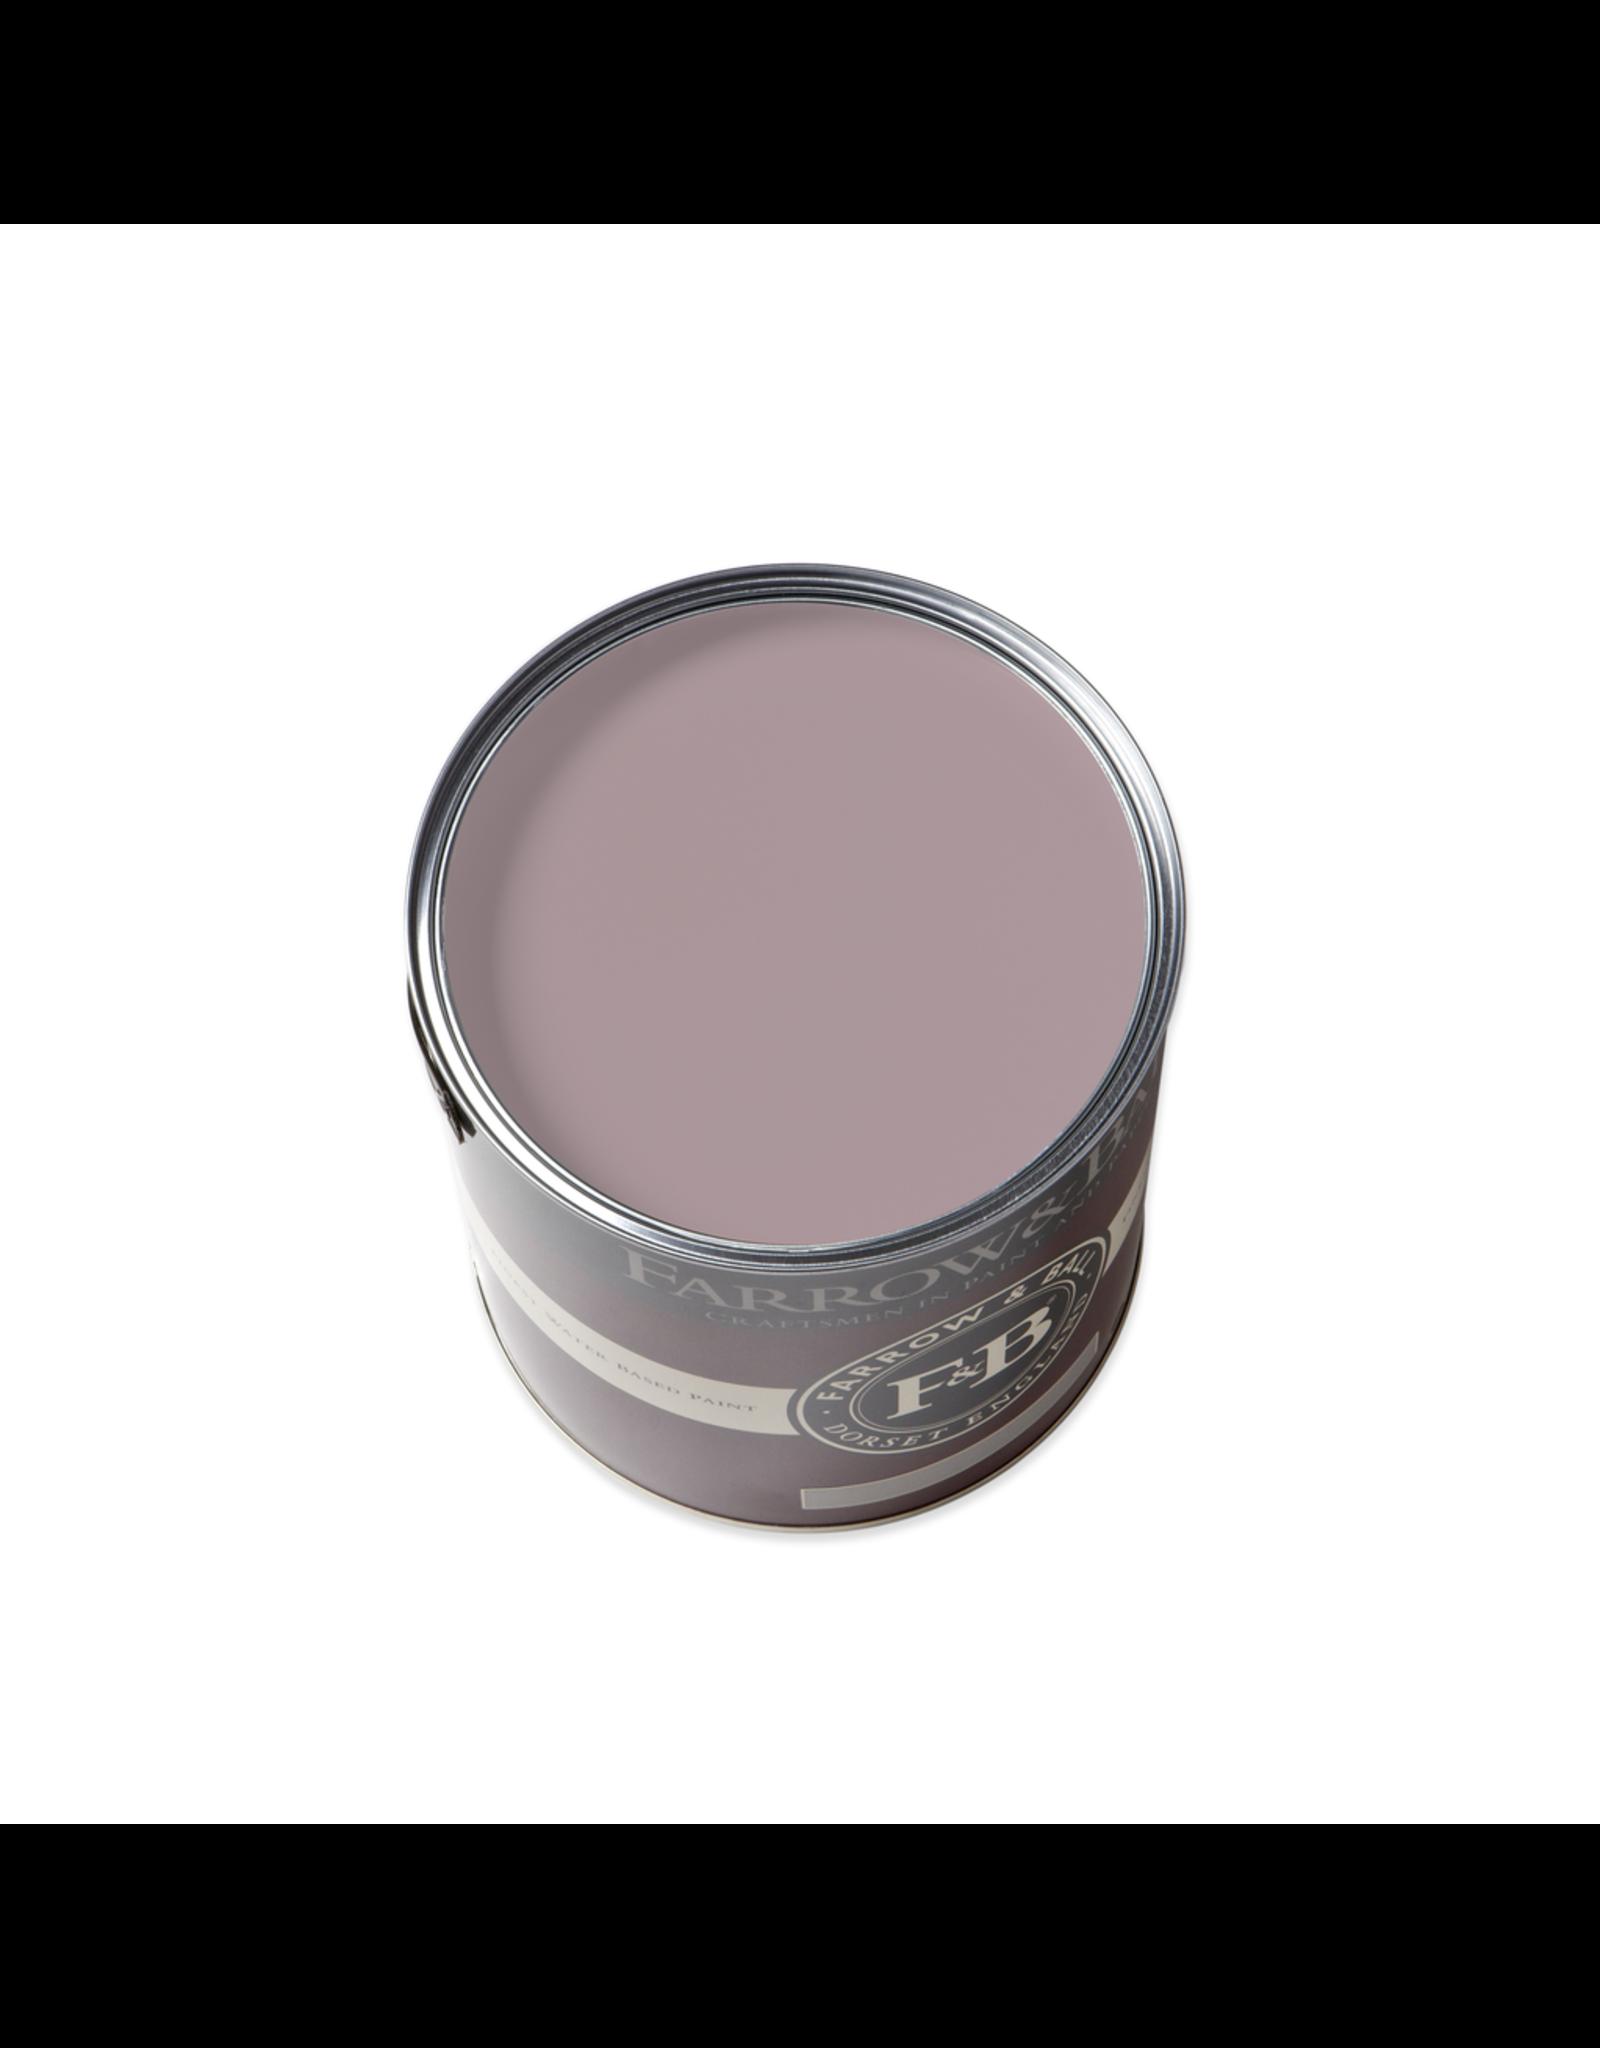 Farrow and Ball Gallon Modern Emulsion Cinder Rose No. 246